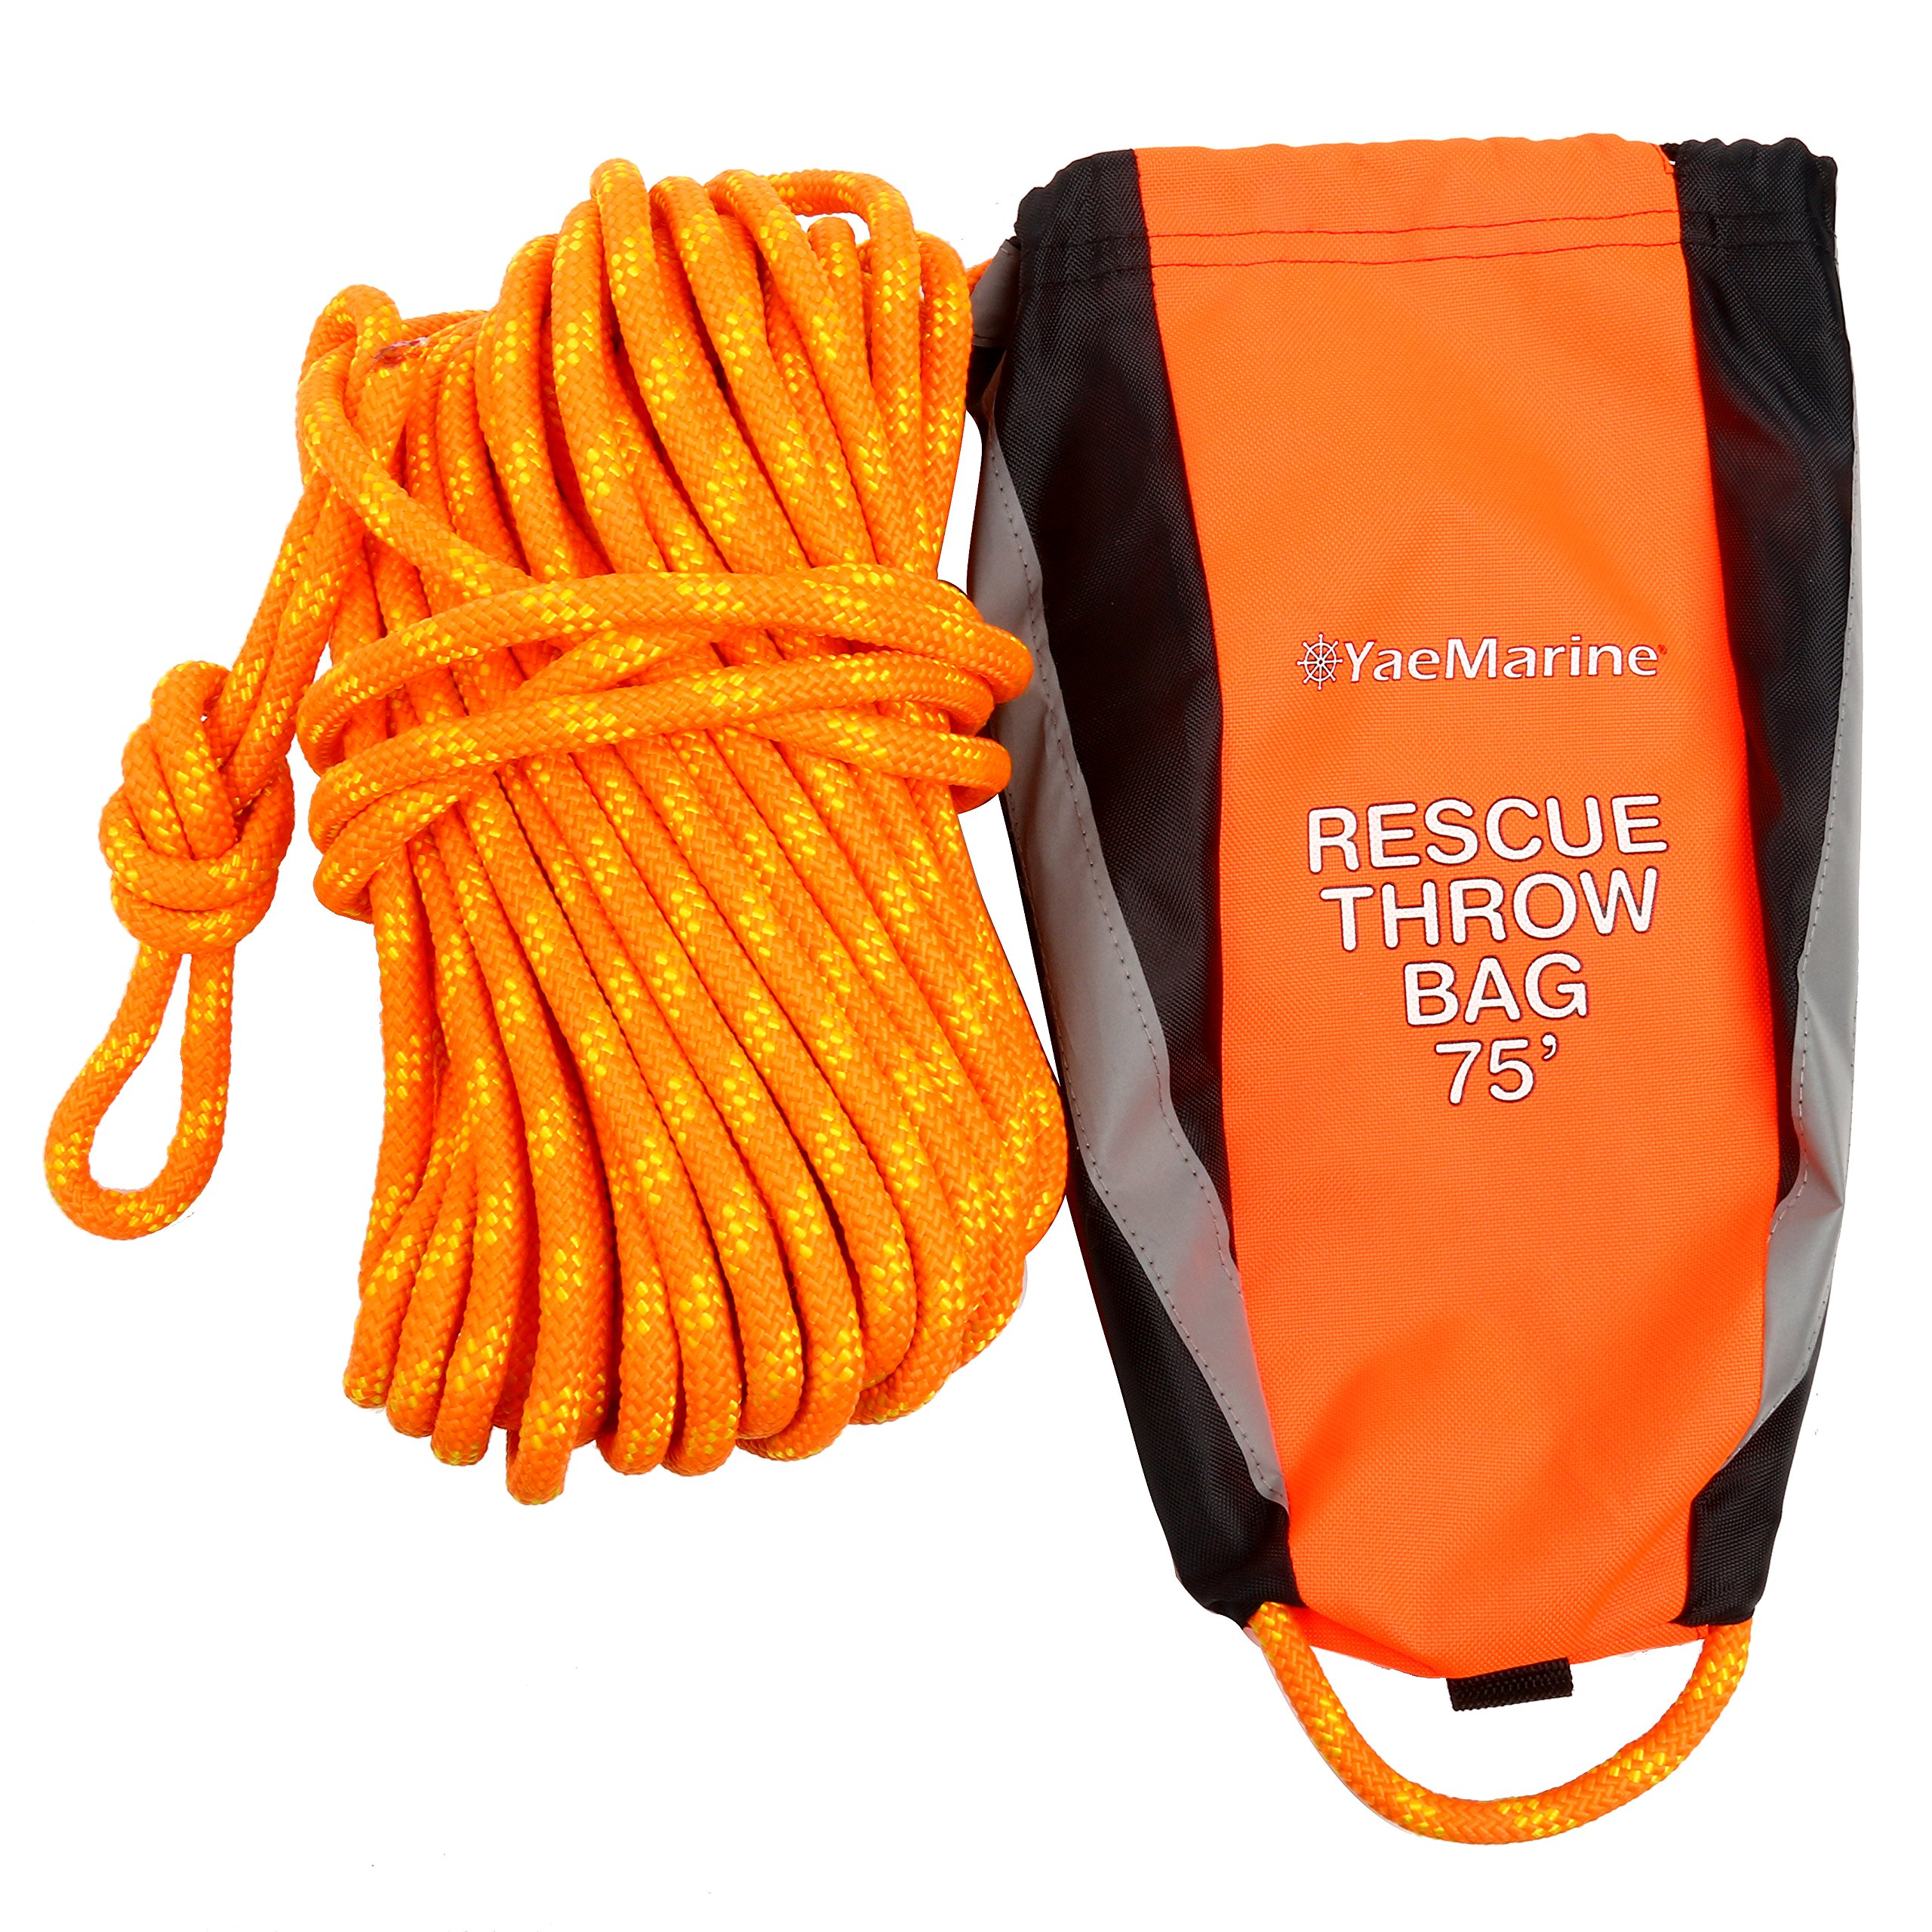 YaeMarine Rescue Throw Bag with 75 Feet Floating Rope for Boating Kayaking Ice Fishing Sailing